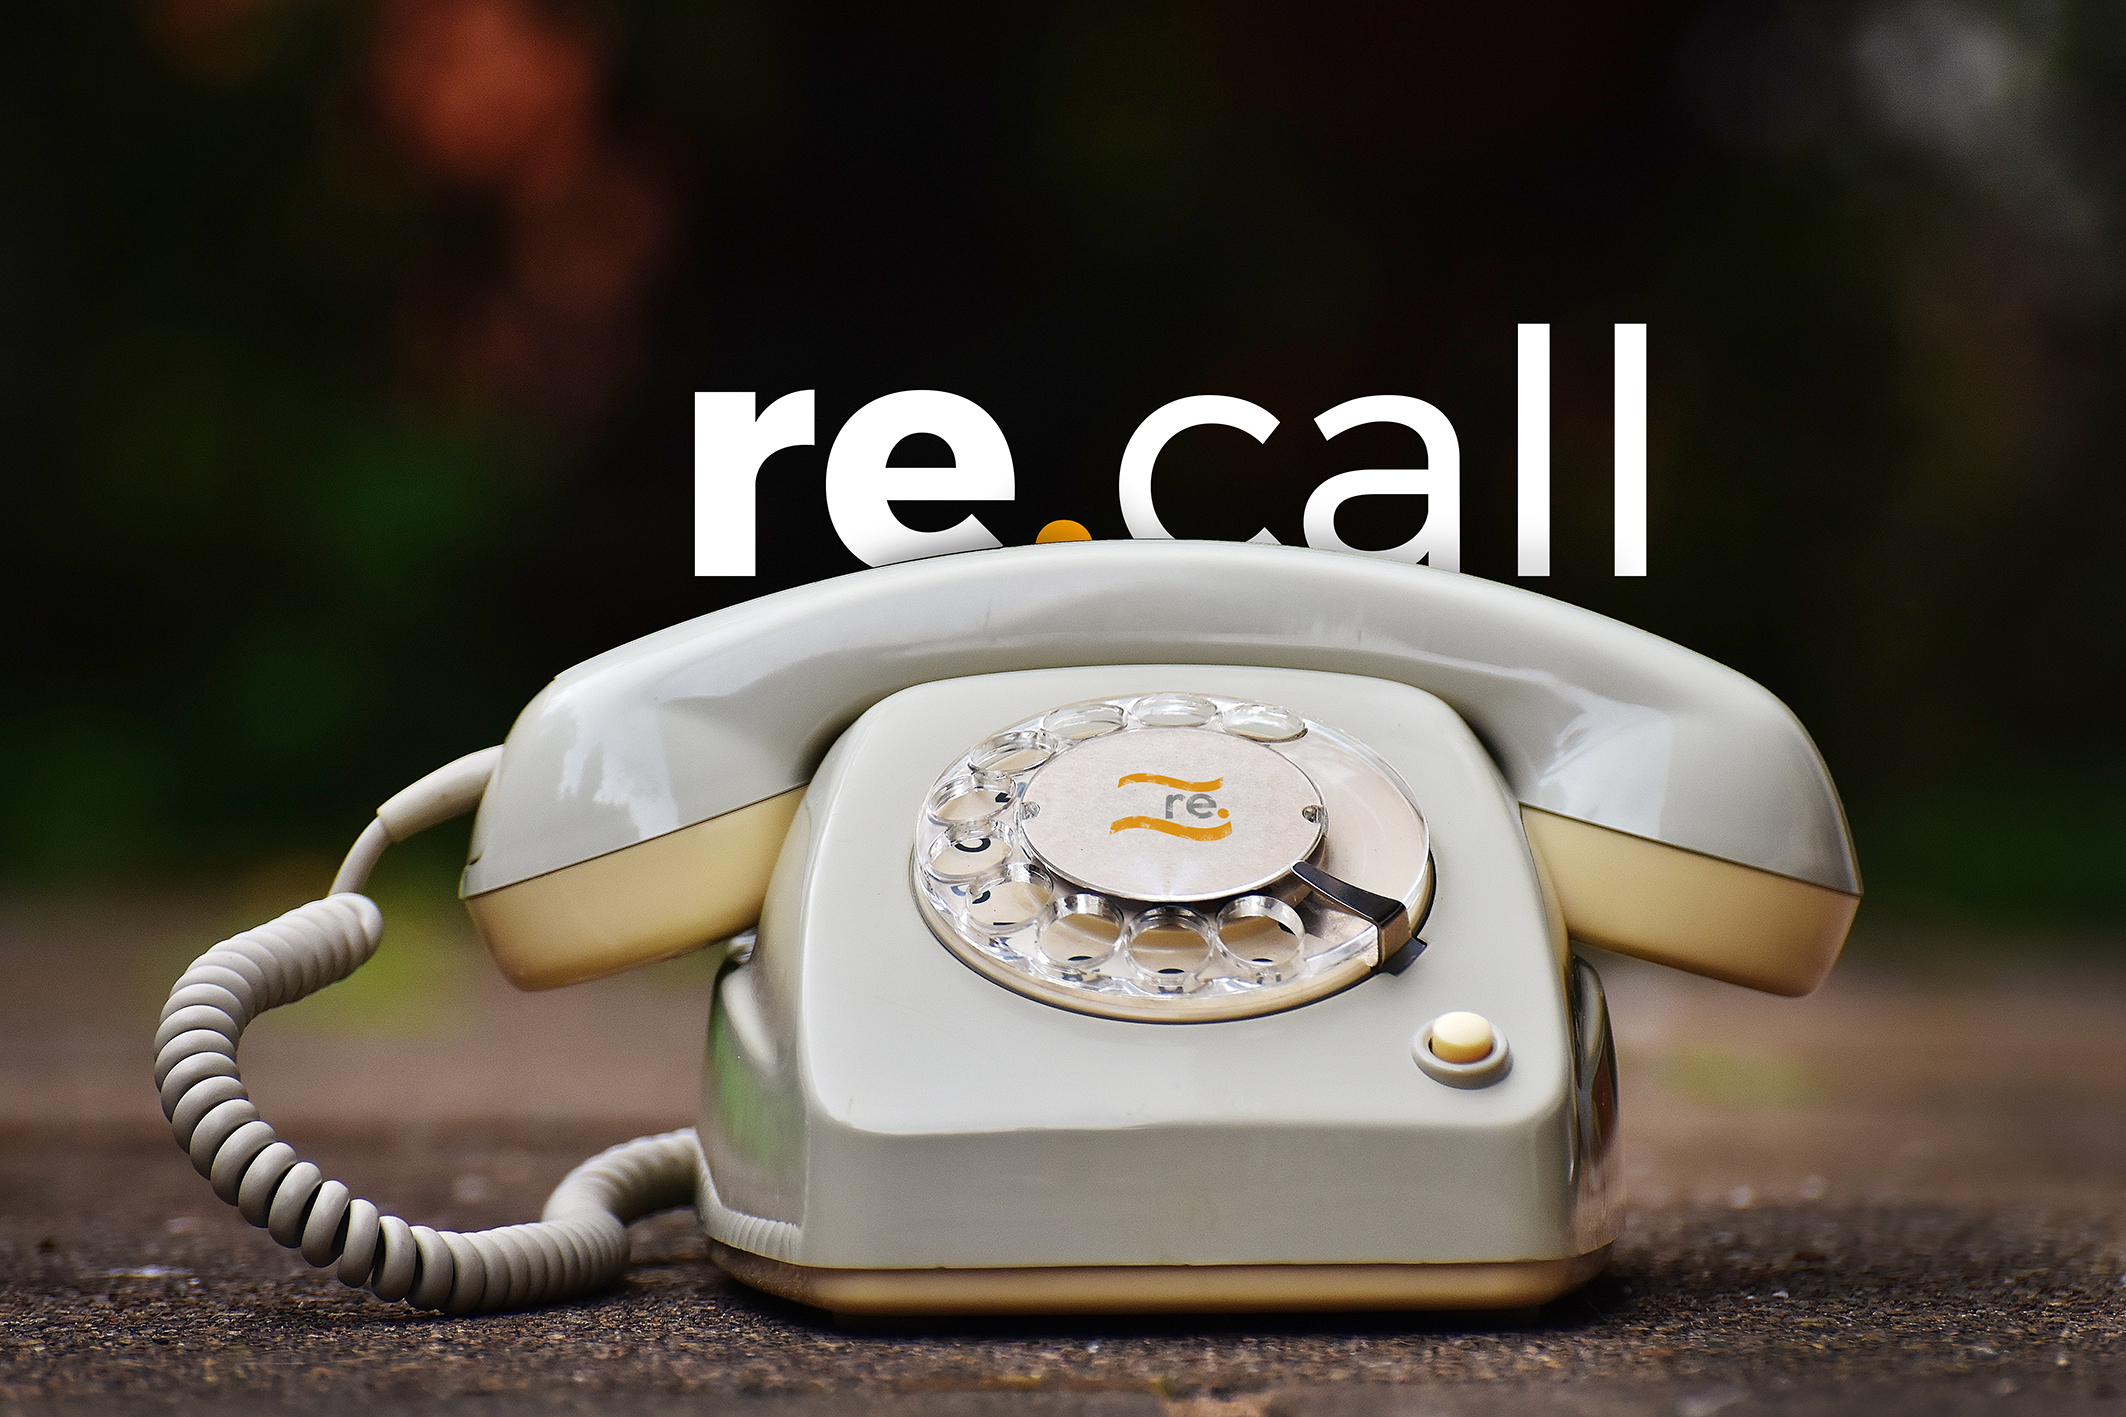 https://www.remodelrepublic.com/wp-content/uploads/2018/04/antique-close-up-cord-209695-rev.jpg